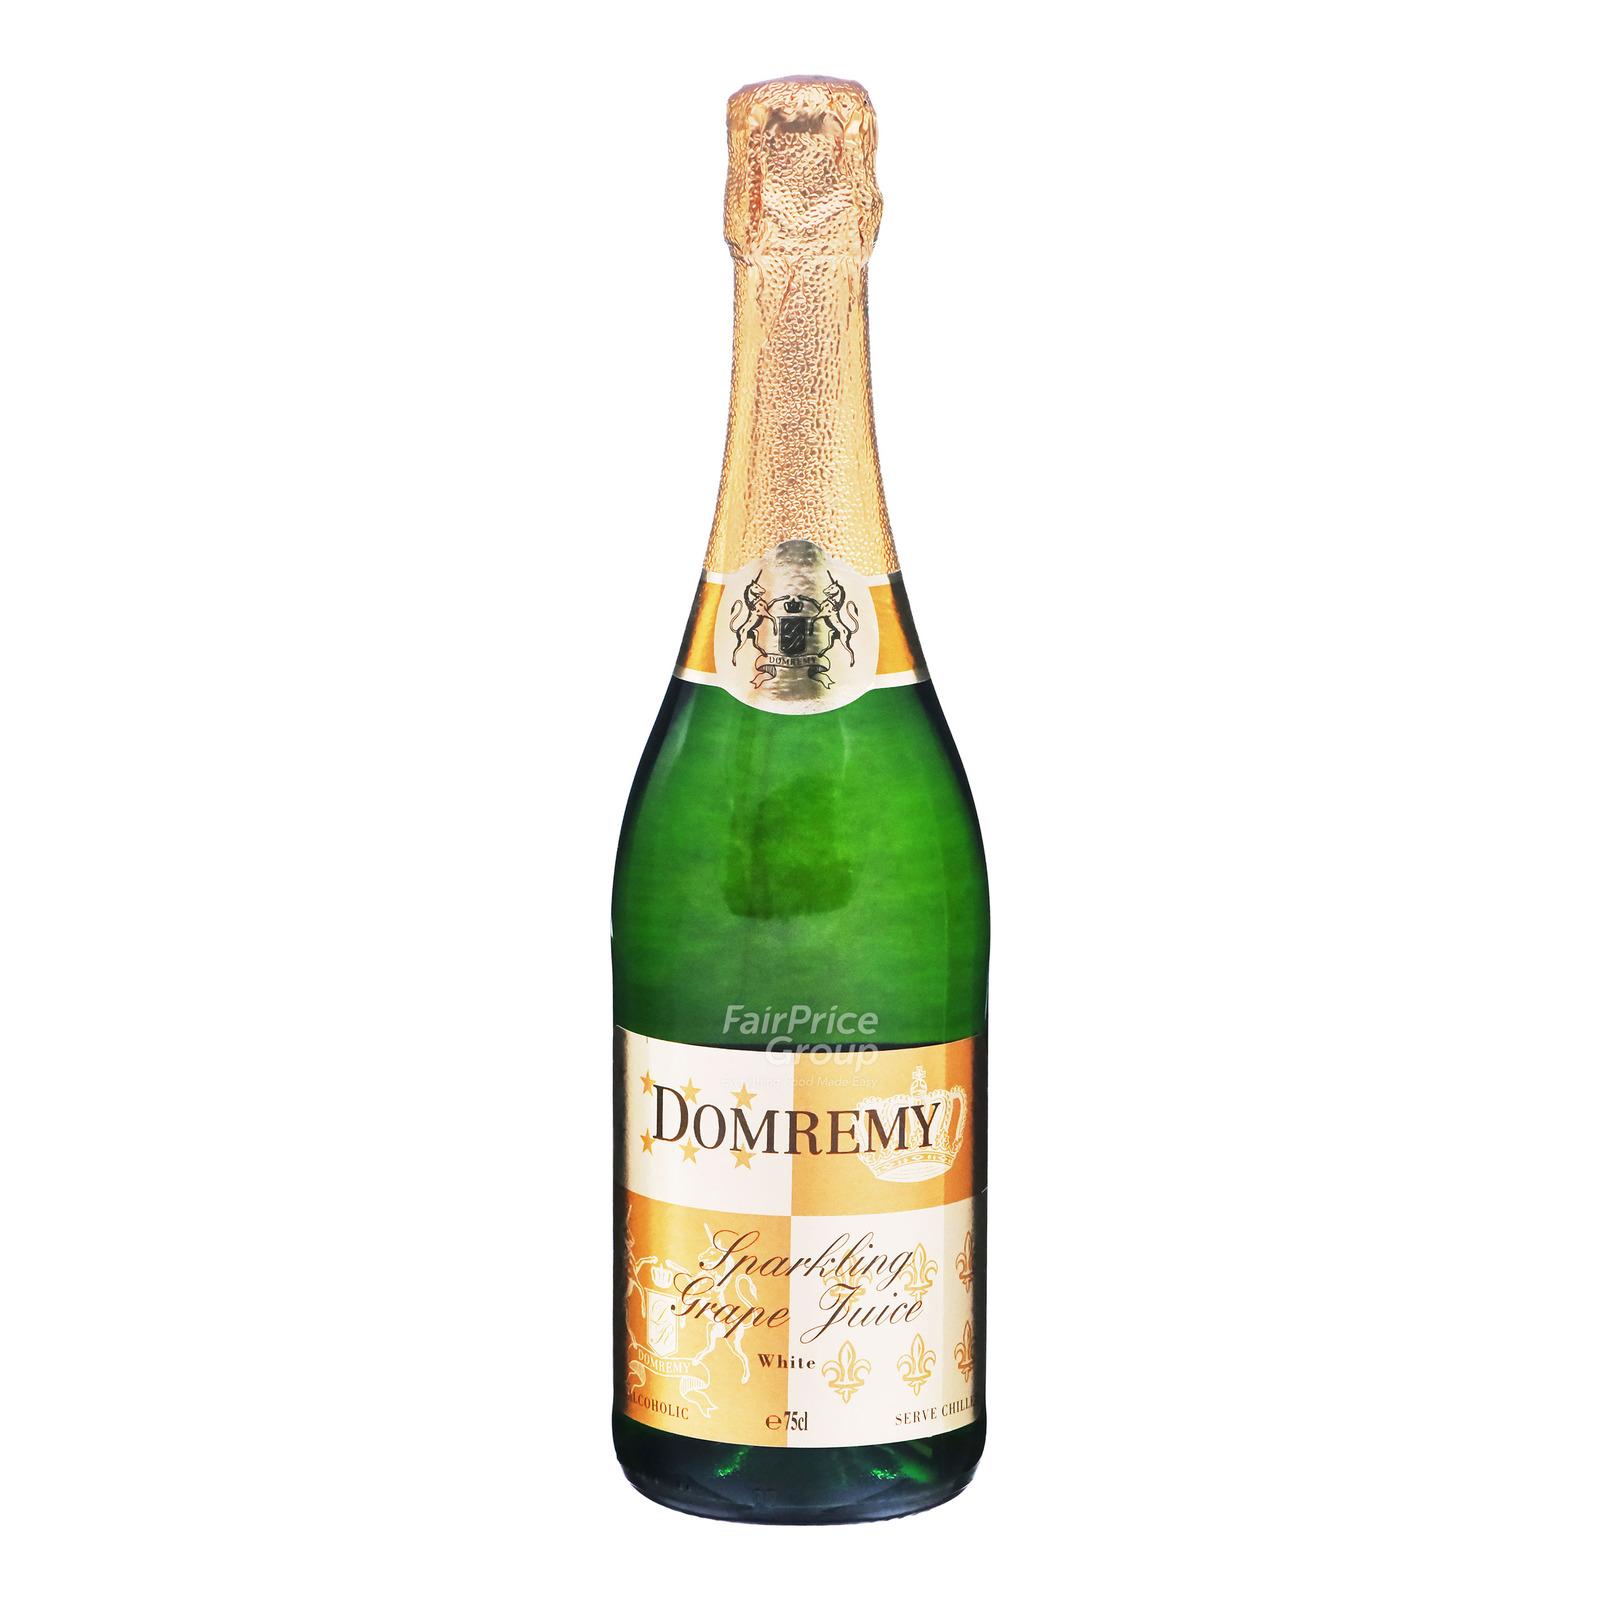 Domremy Sparkling Juice - White Grape